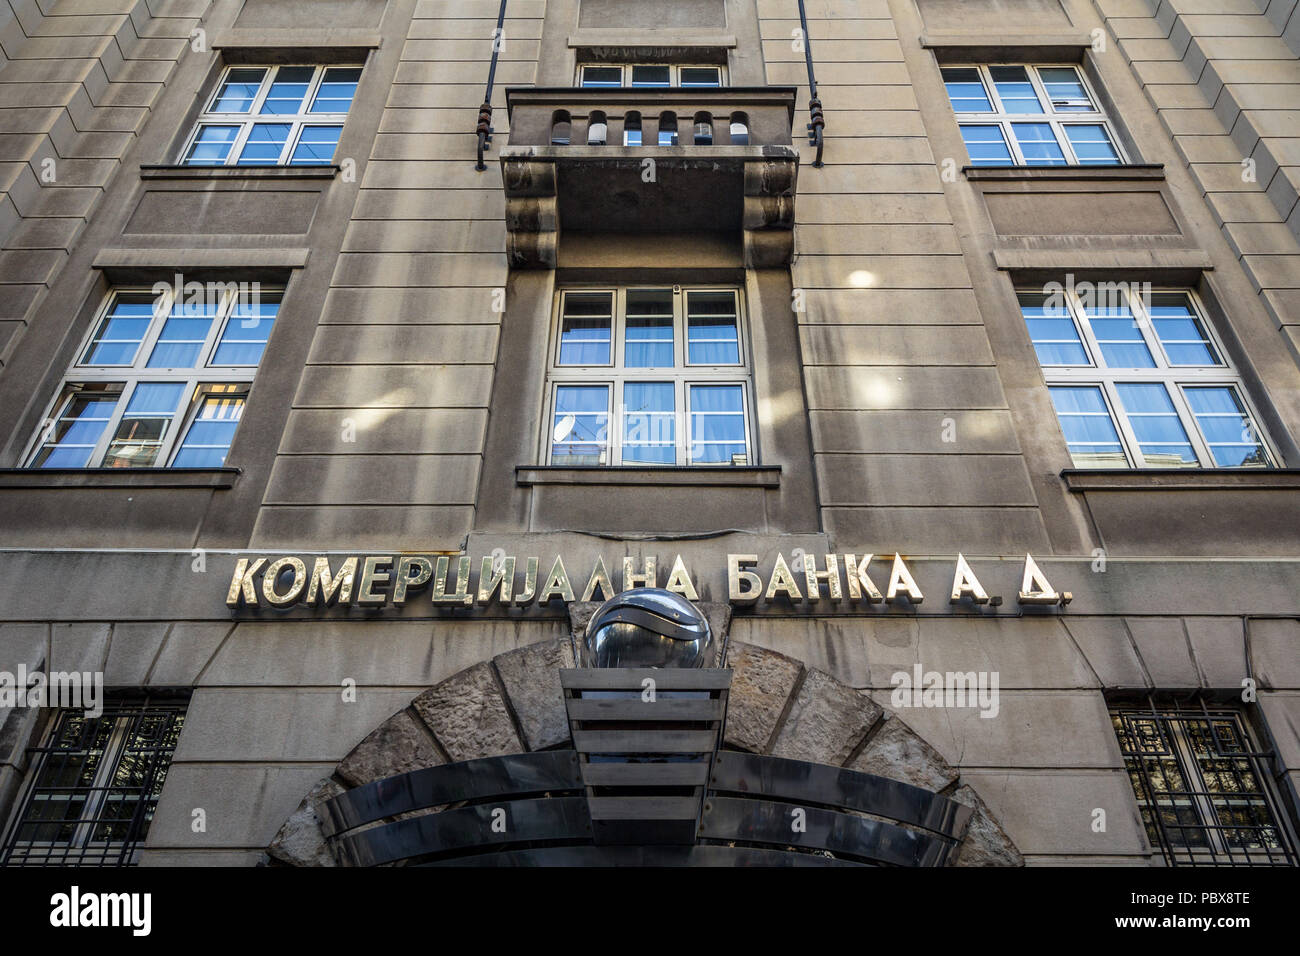 BELGRADE, SERBIA - JULY 21, 2018: Komercijalna Banka logo on their main office in Belgrade. Currently being privatized, Komercijalna Banka is Serbian  - Stock Image